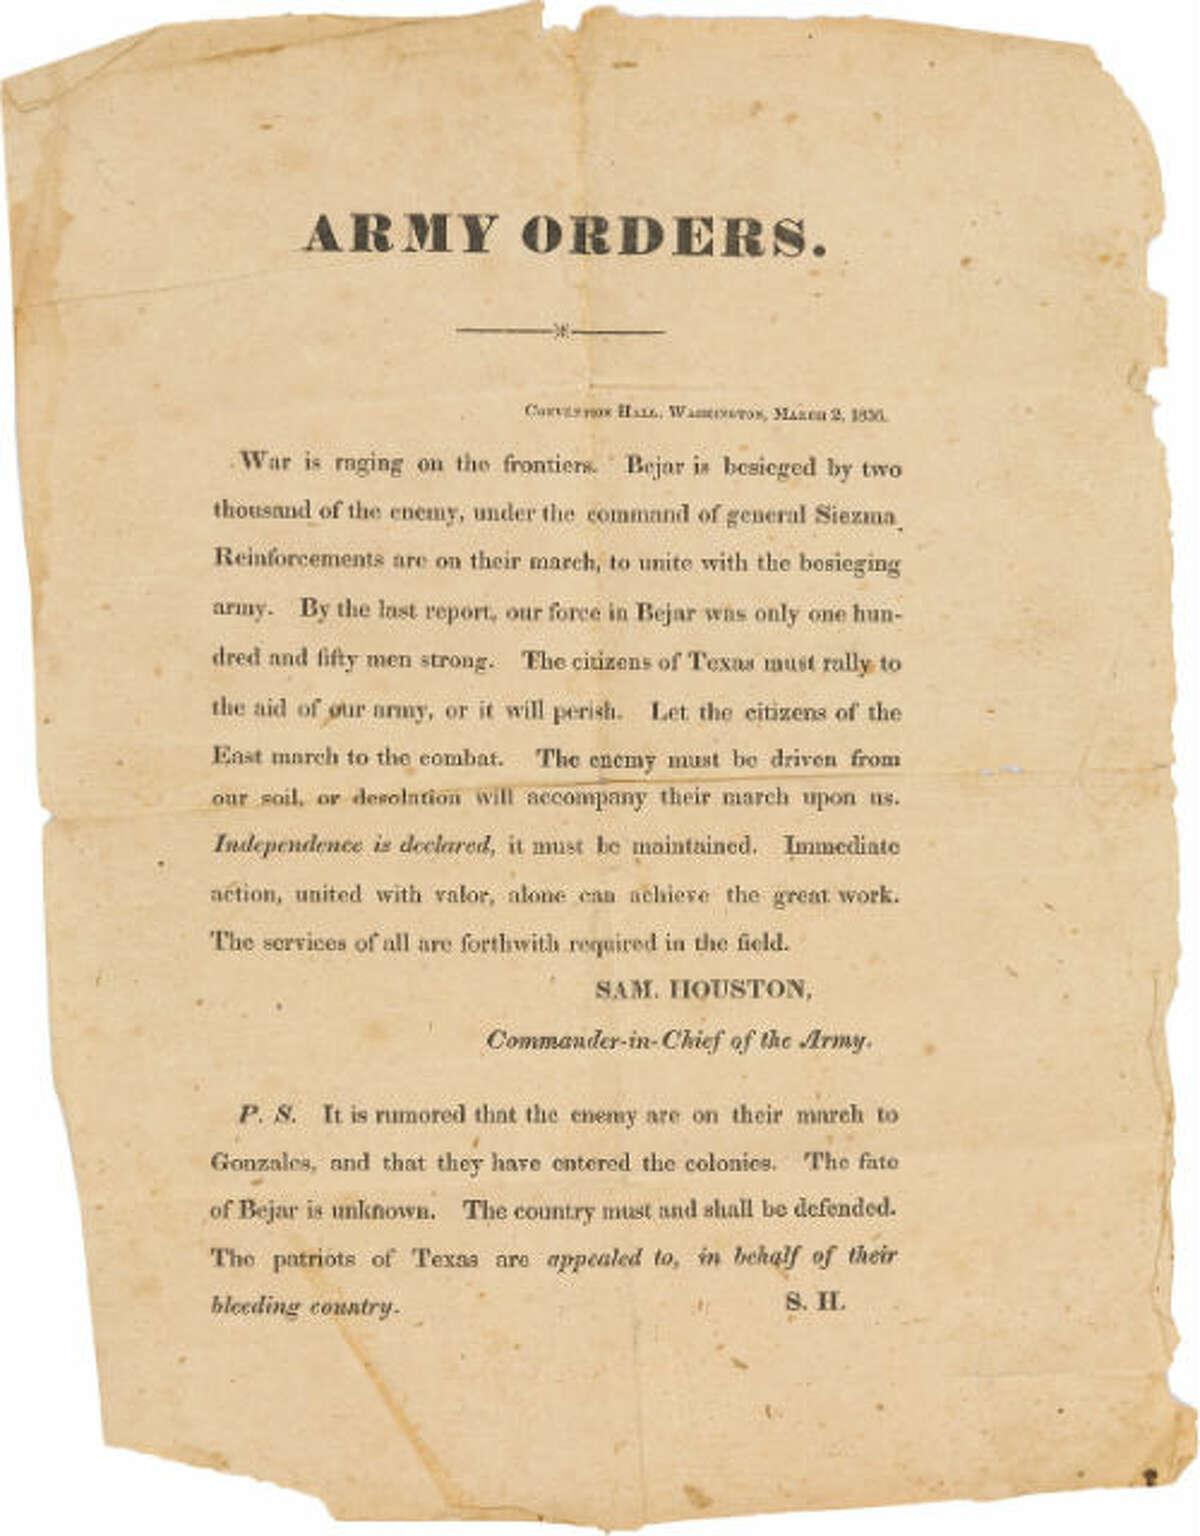 Sam Houston broadside, dated March 2, 1836